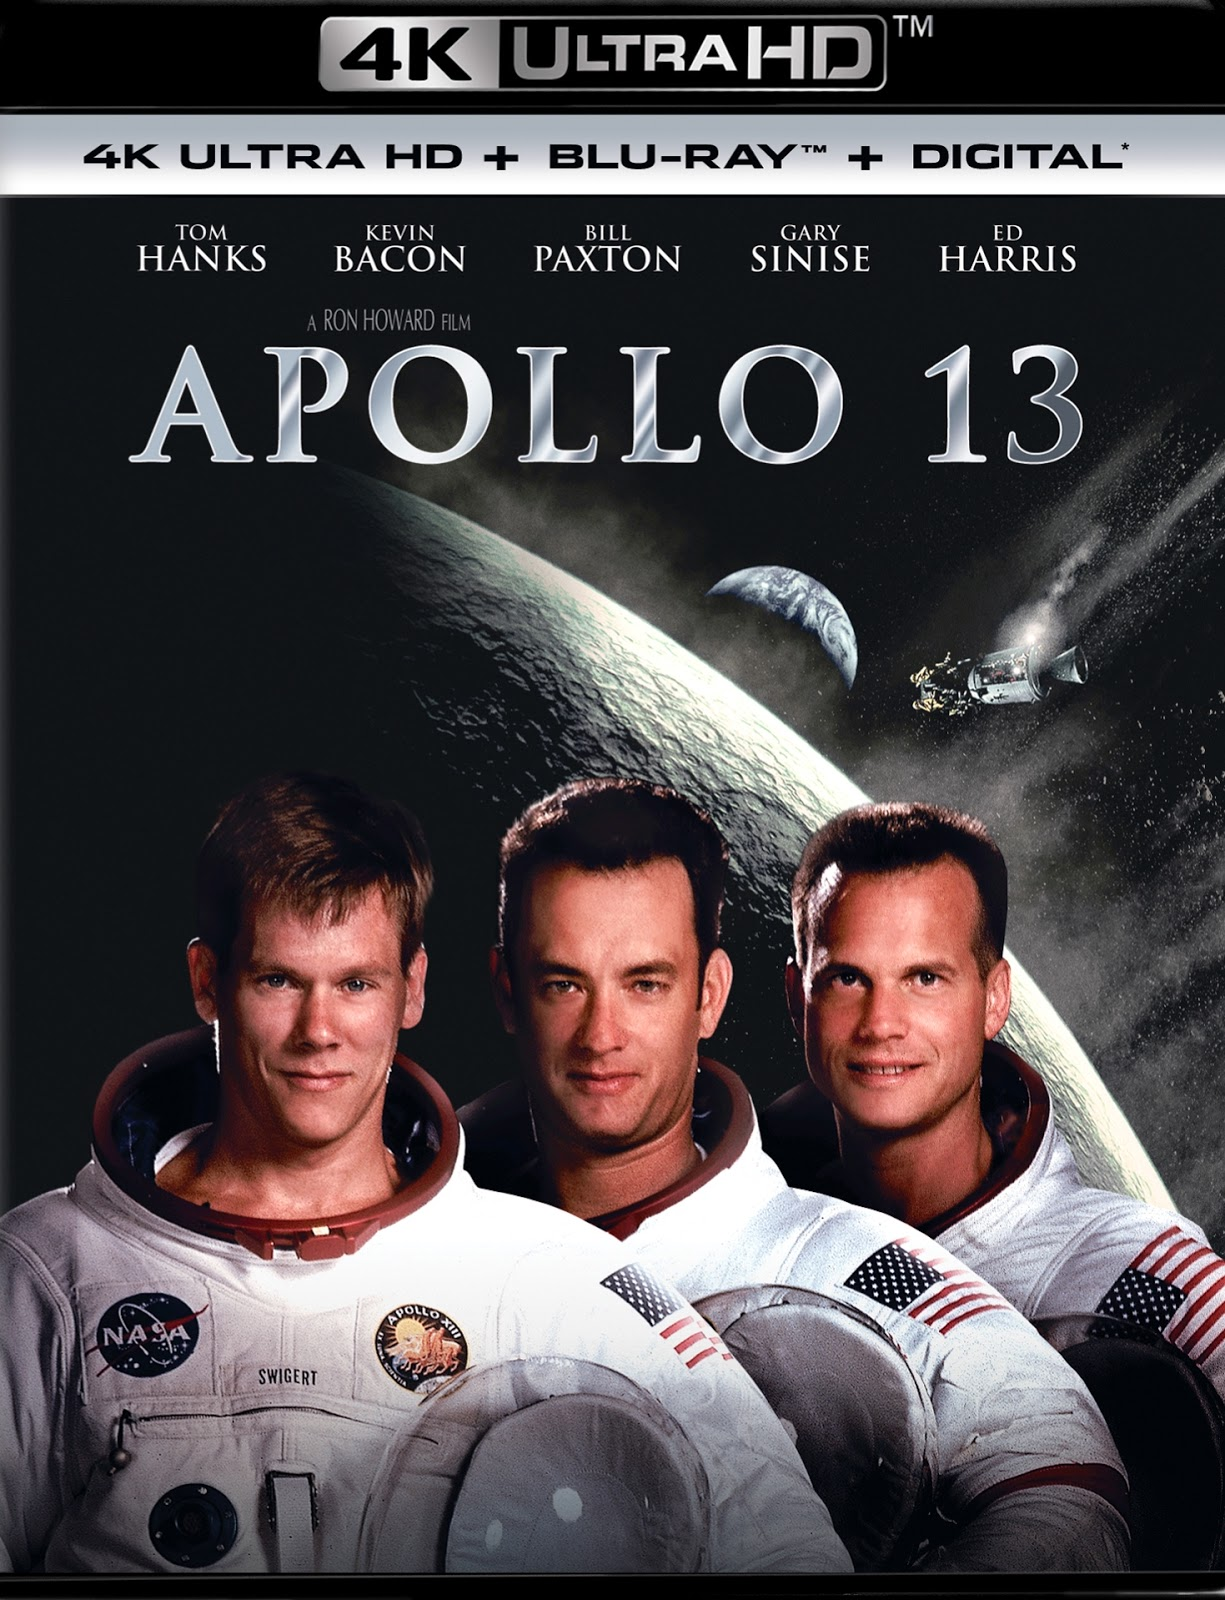 APOLLO 13: 4K Ultra HD Blu-ray (Universal, 1995) Universal